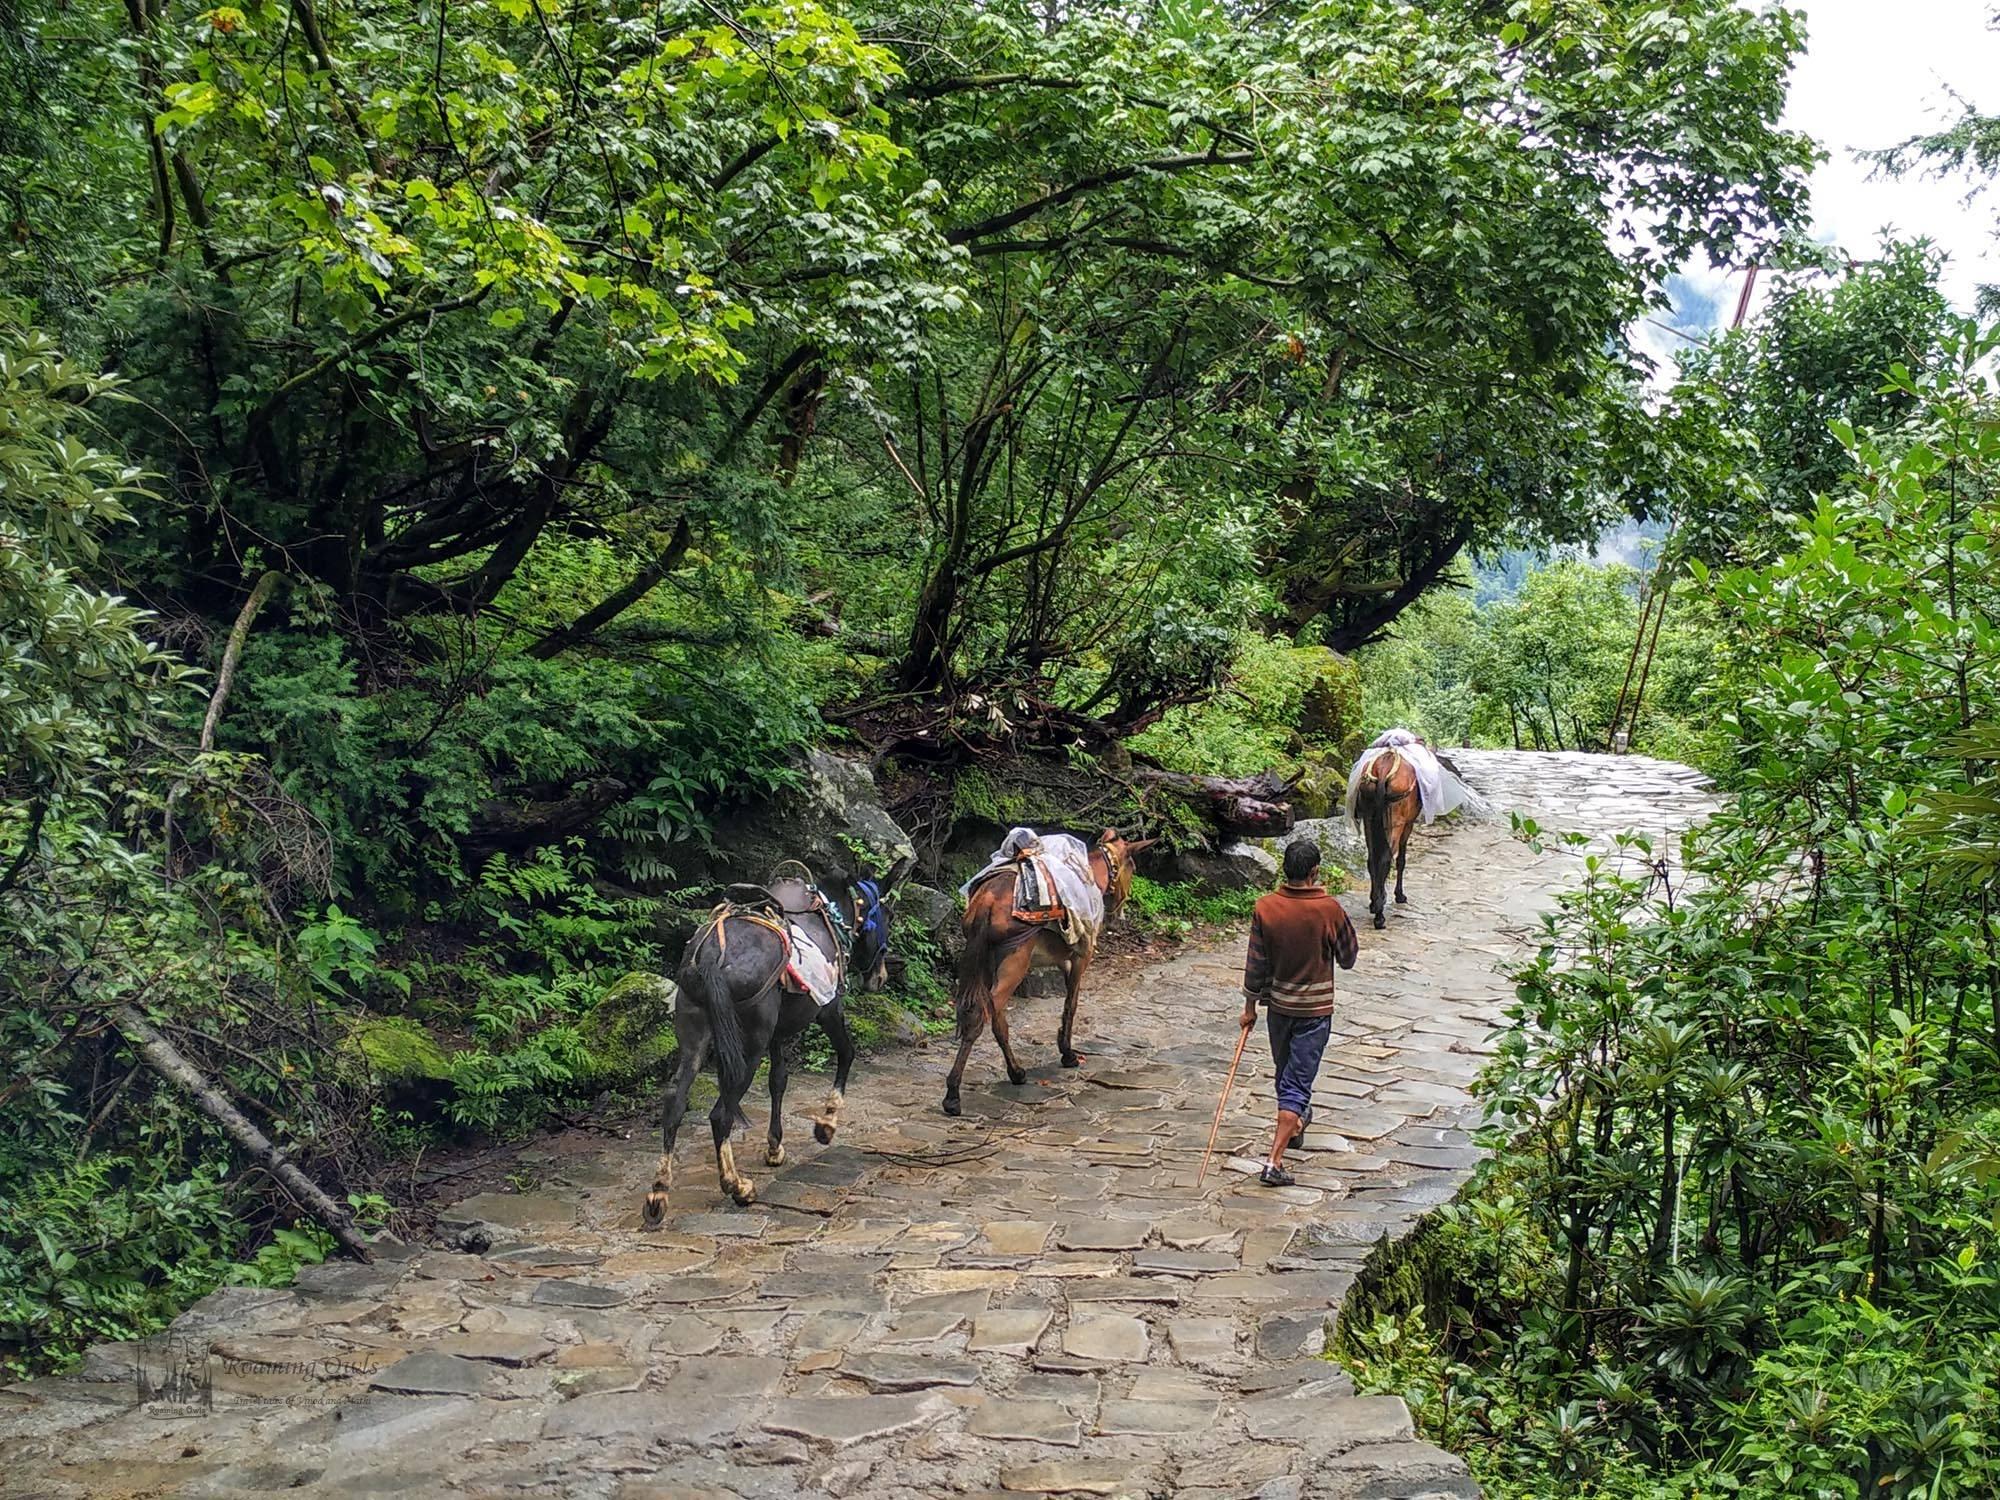 Hemkund sahib path, mules Hemkund,Ghangaria Govindghat trek, Ghangaria Mules trek path